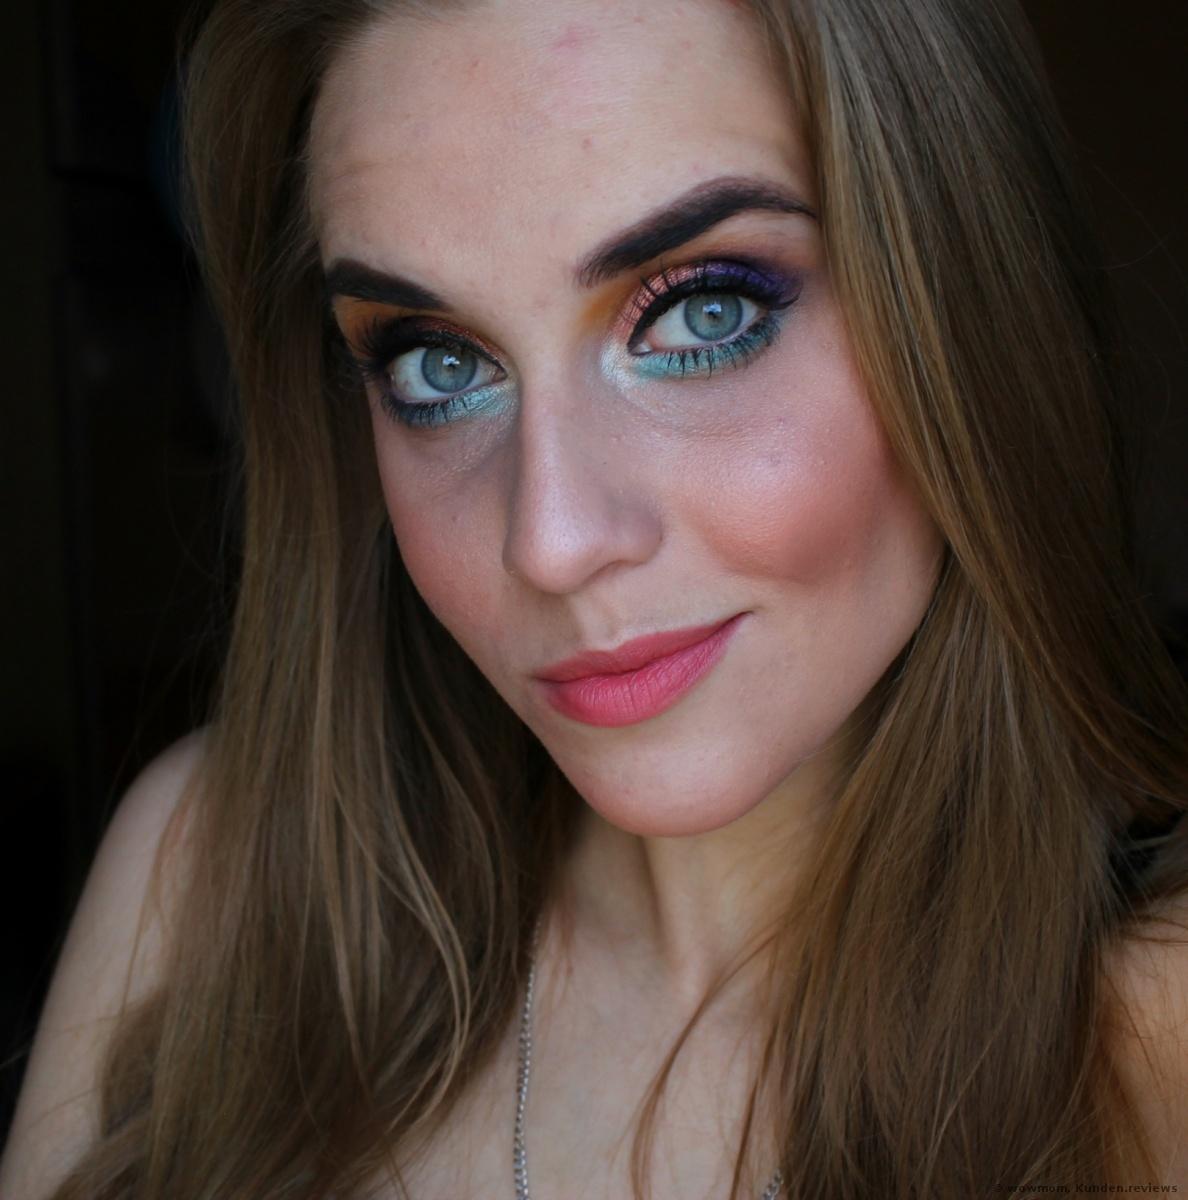 Morphe Jaclyn Hill Eyeshadow Palette